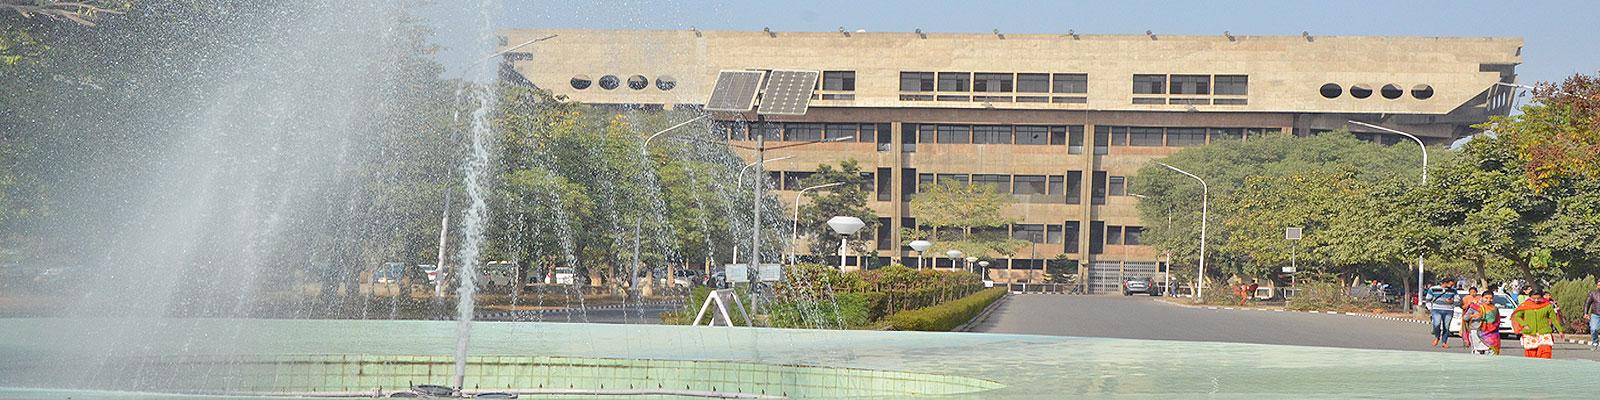 GNDU (Guru Nanak Dev University), Amritsar Image